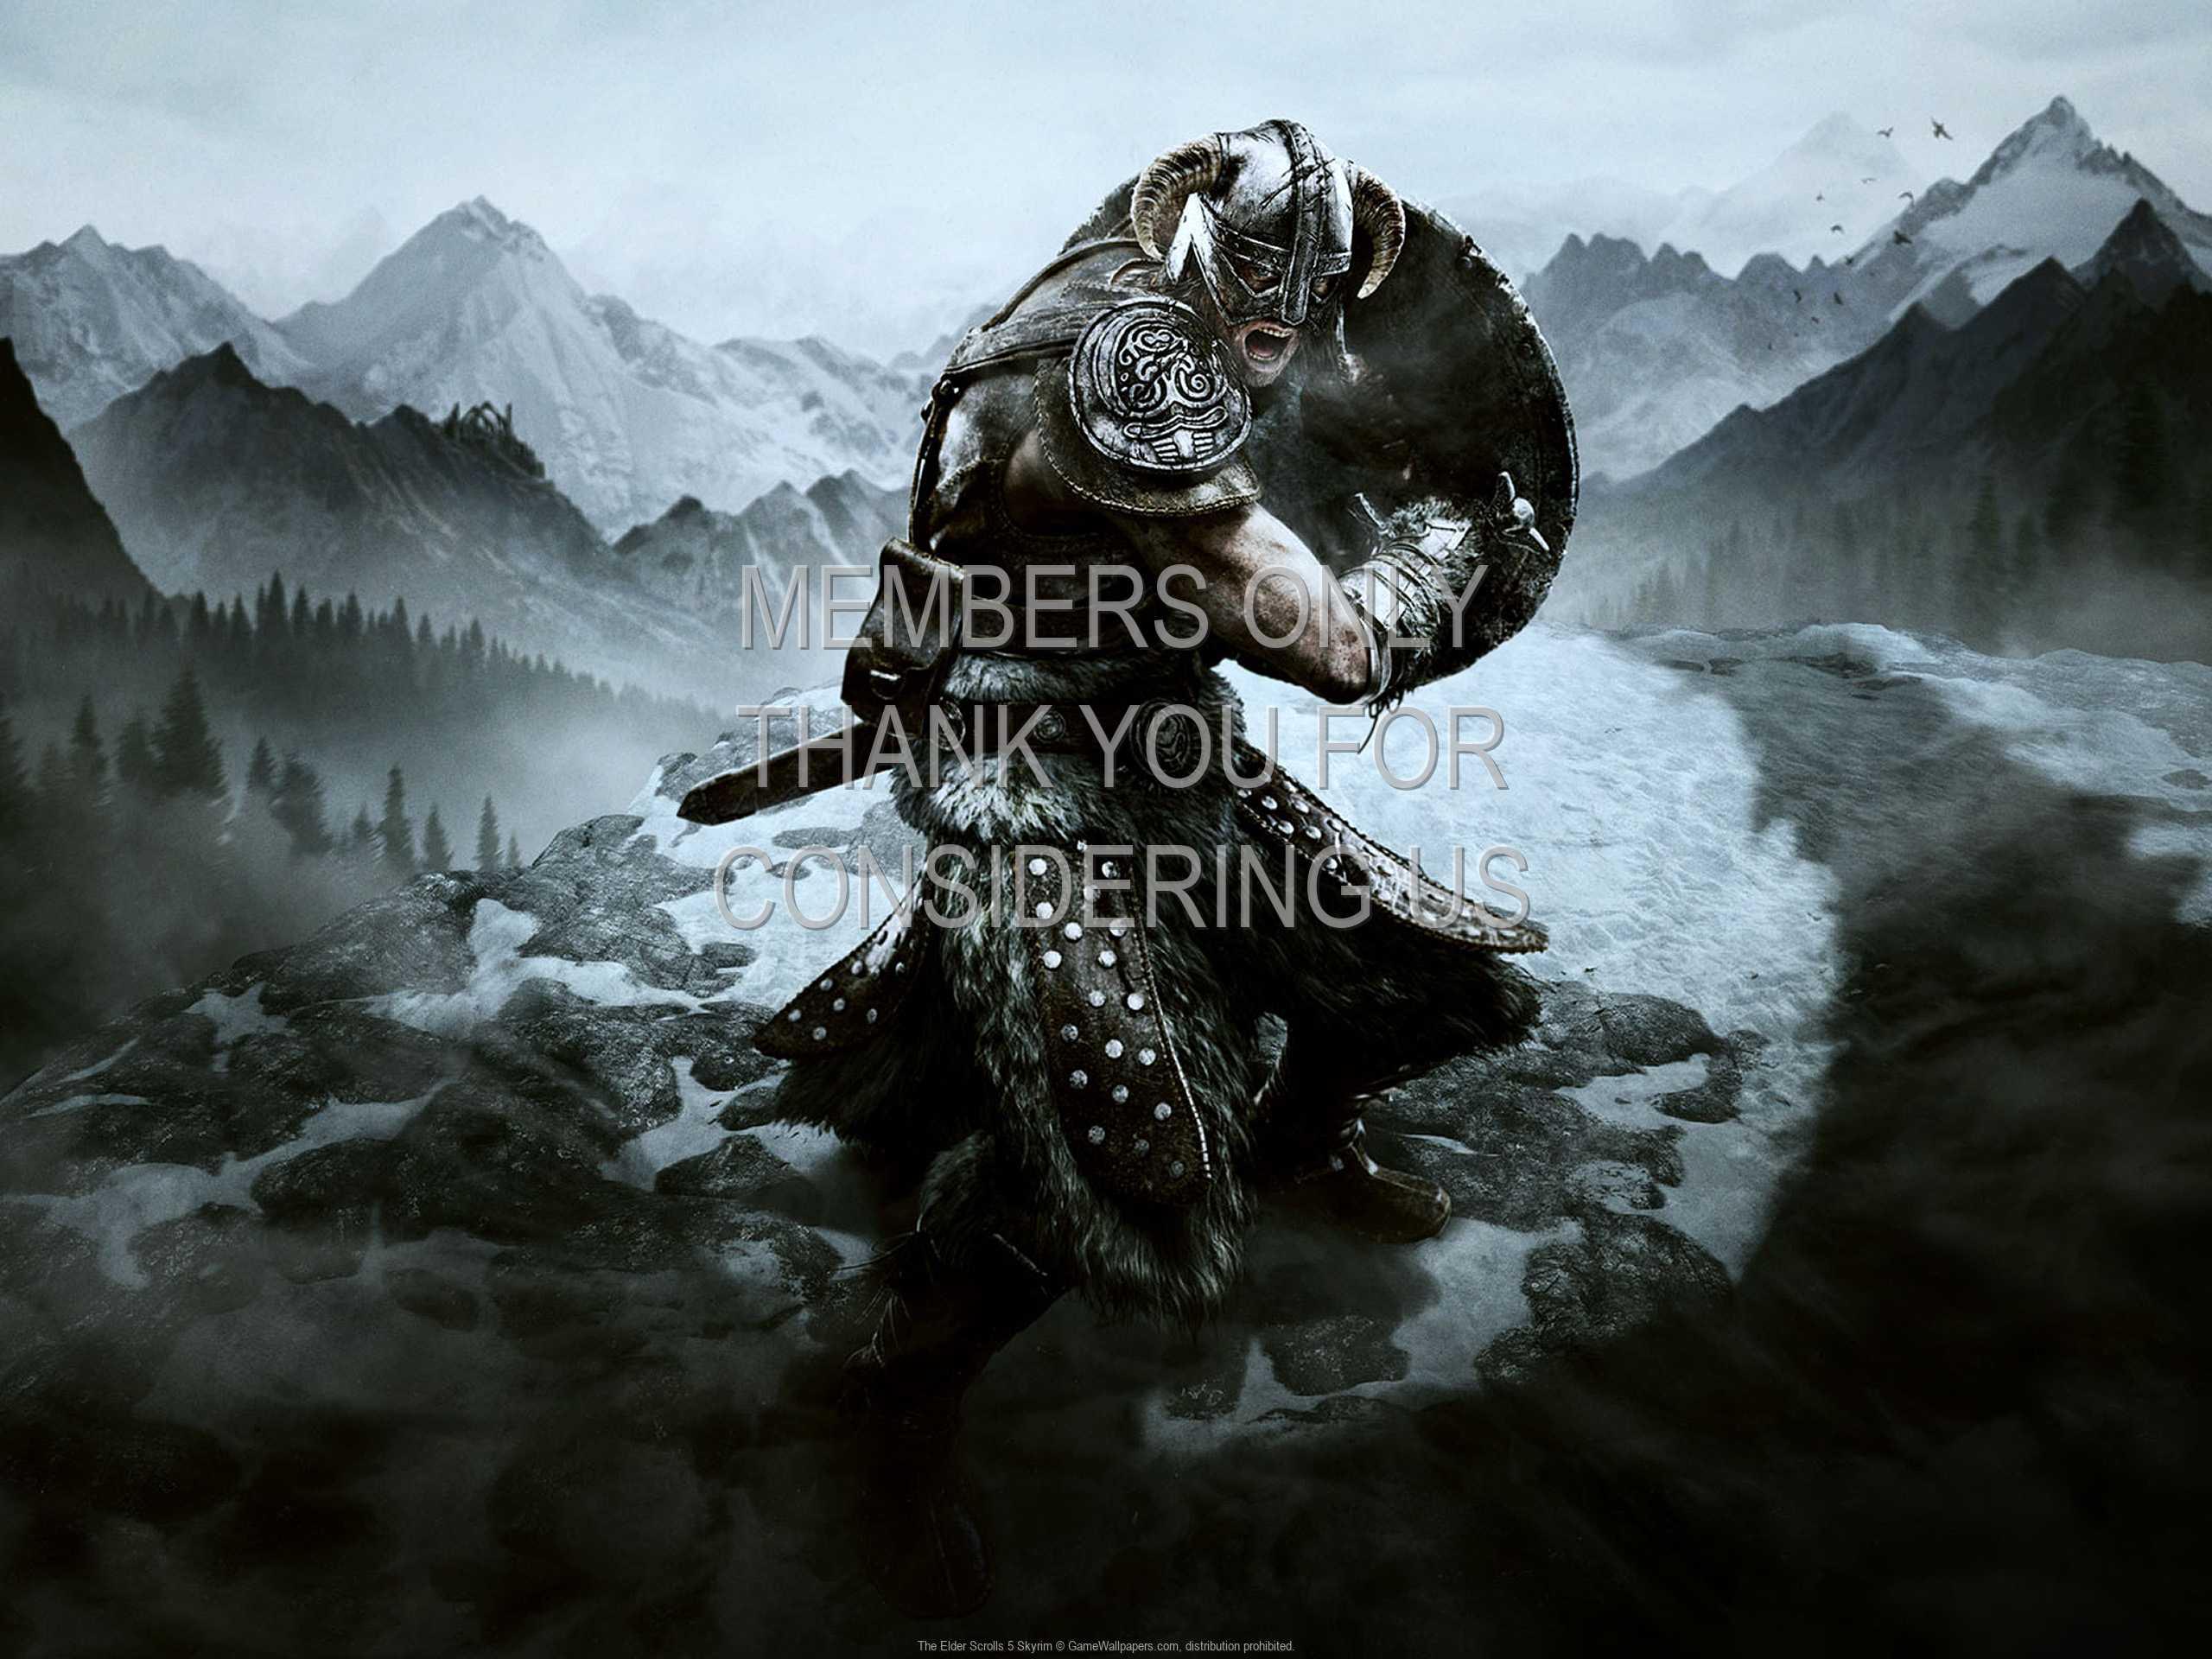 The Elder Scrolls 5: Skyrim 1080p Horizontal Handy Hintergrundbild 03